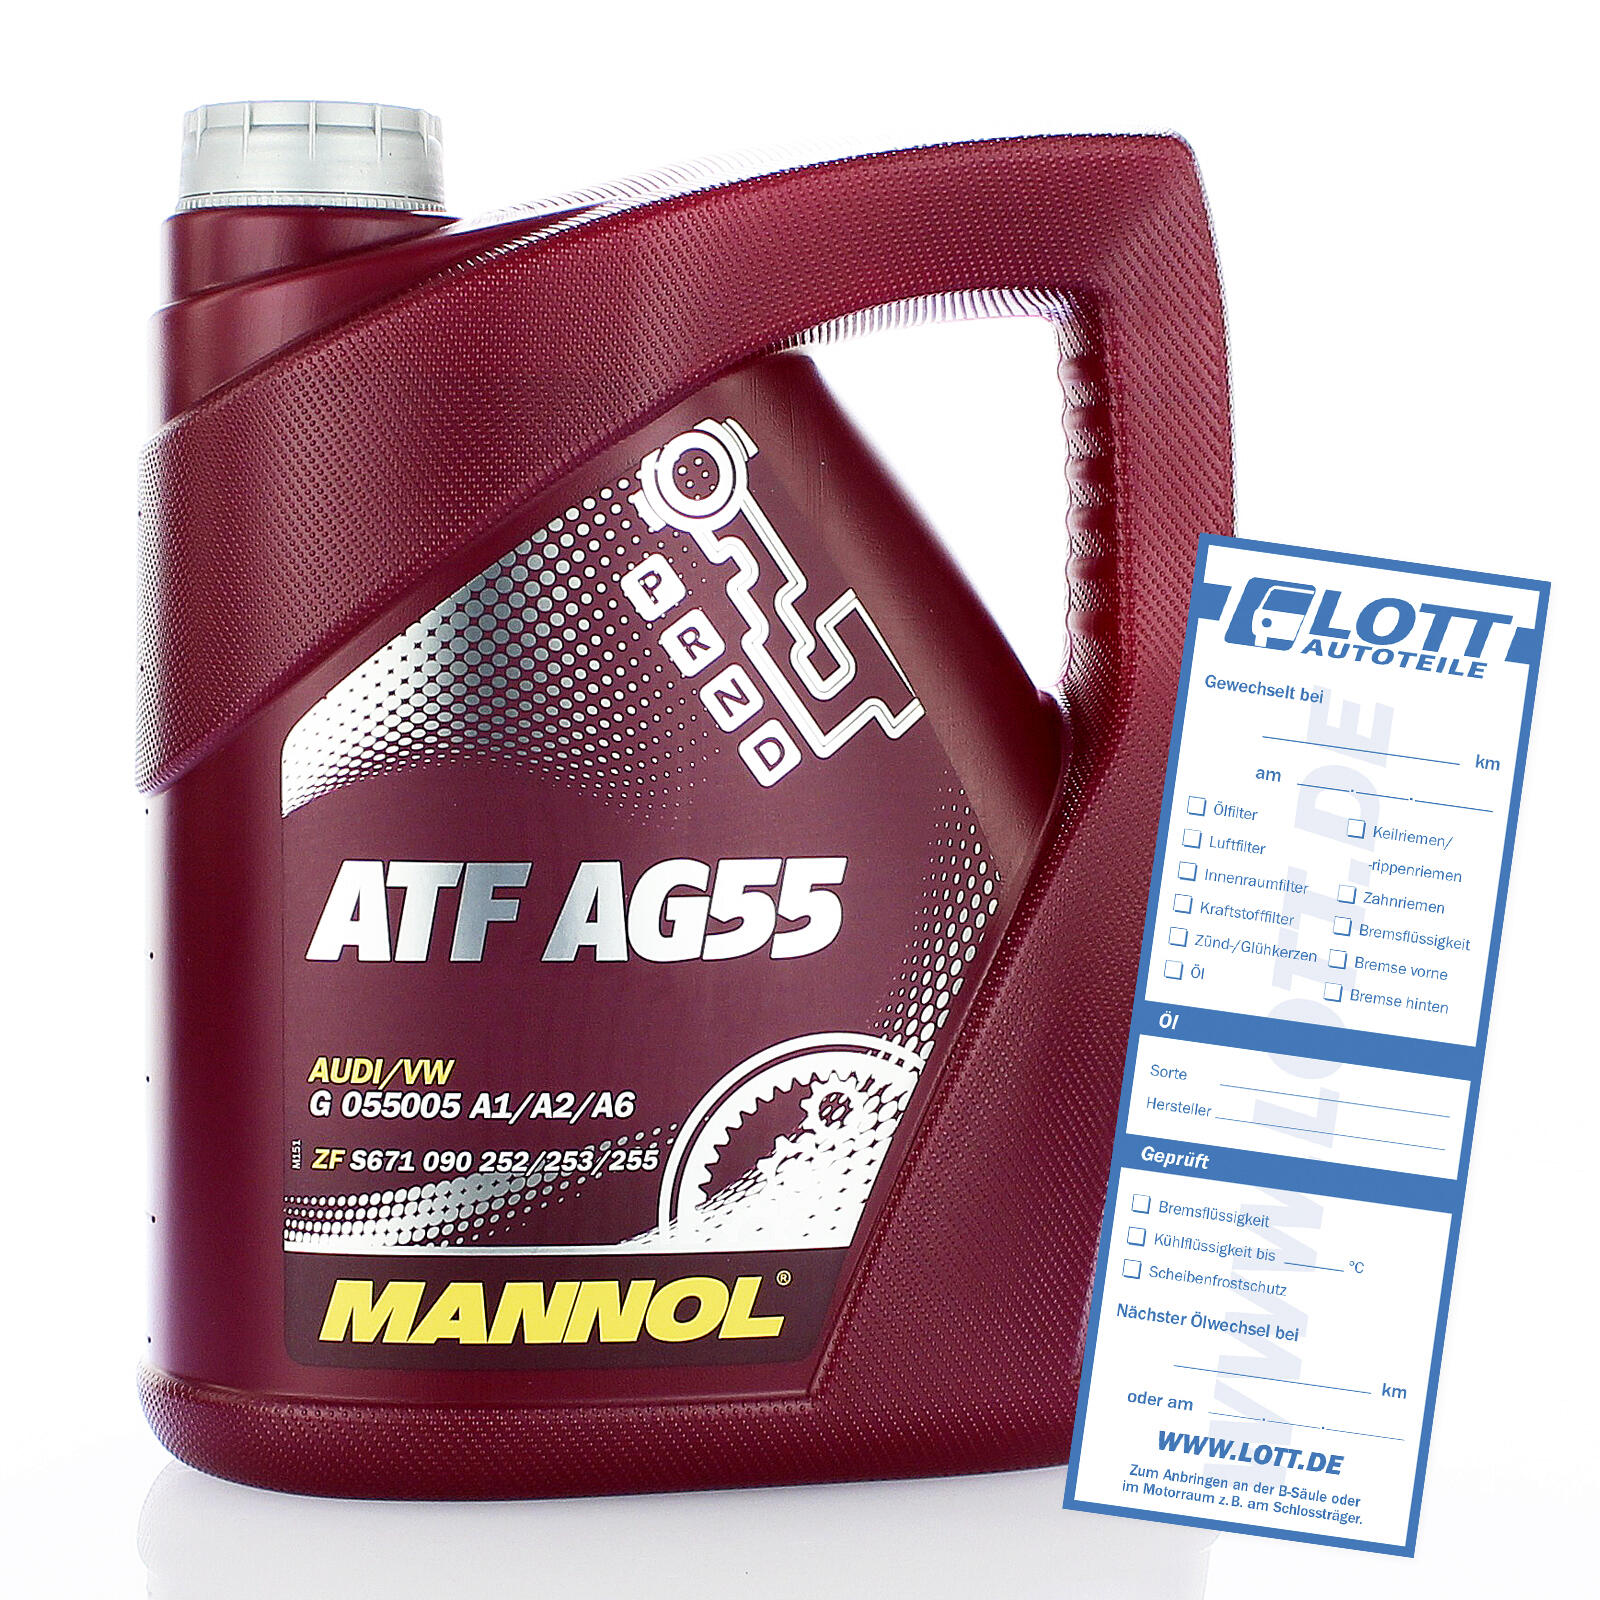 MANNOL ATF AG55 Automatik Getriebeöl 4 Liter